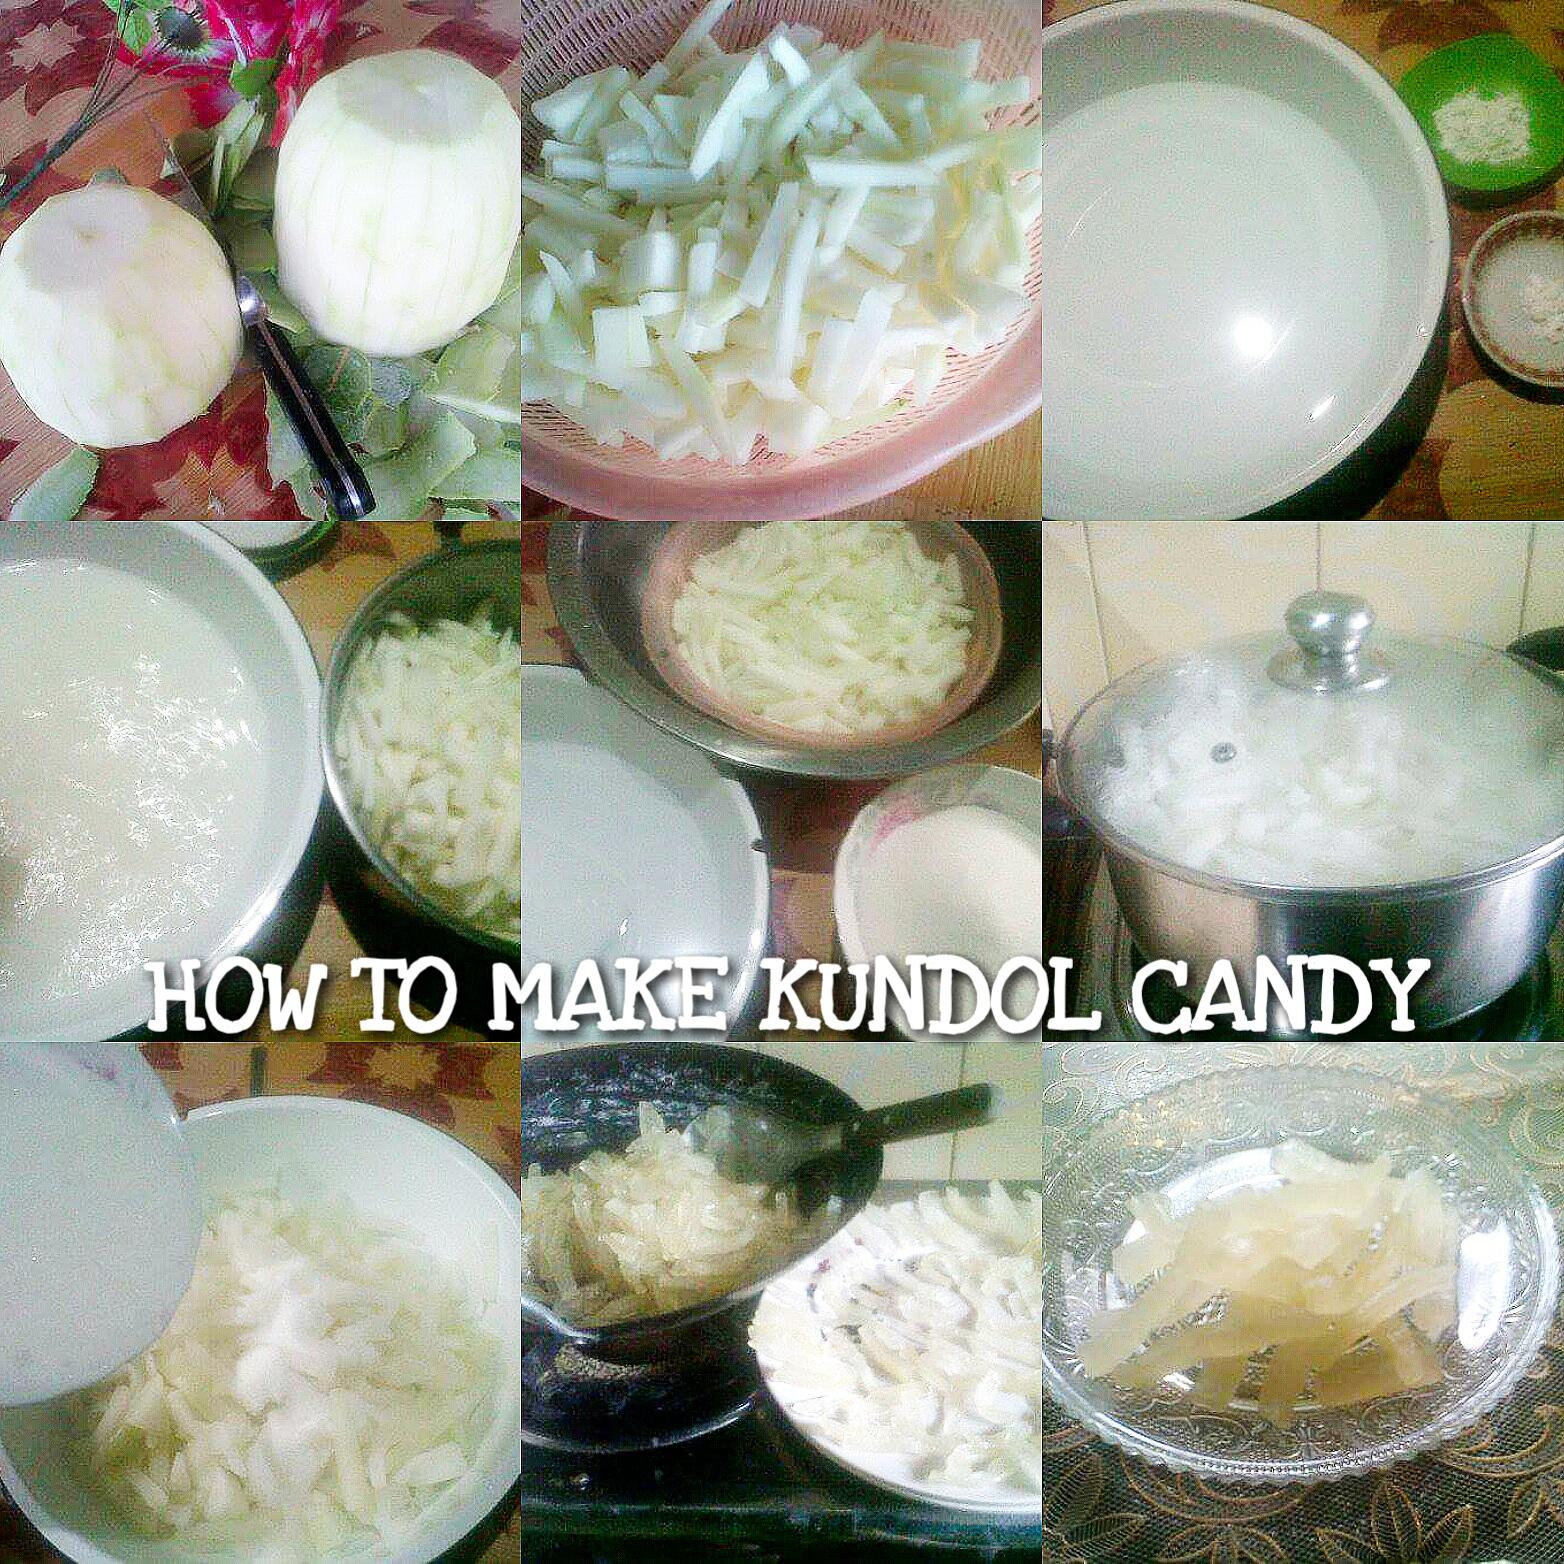 How to make Kundol Candy